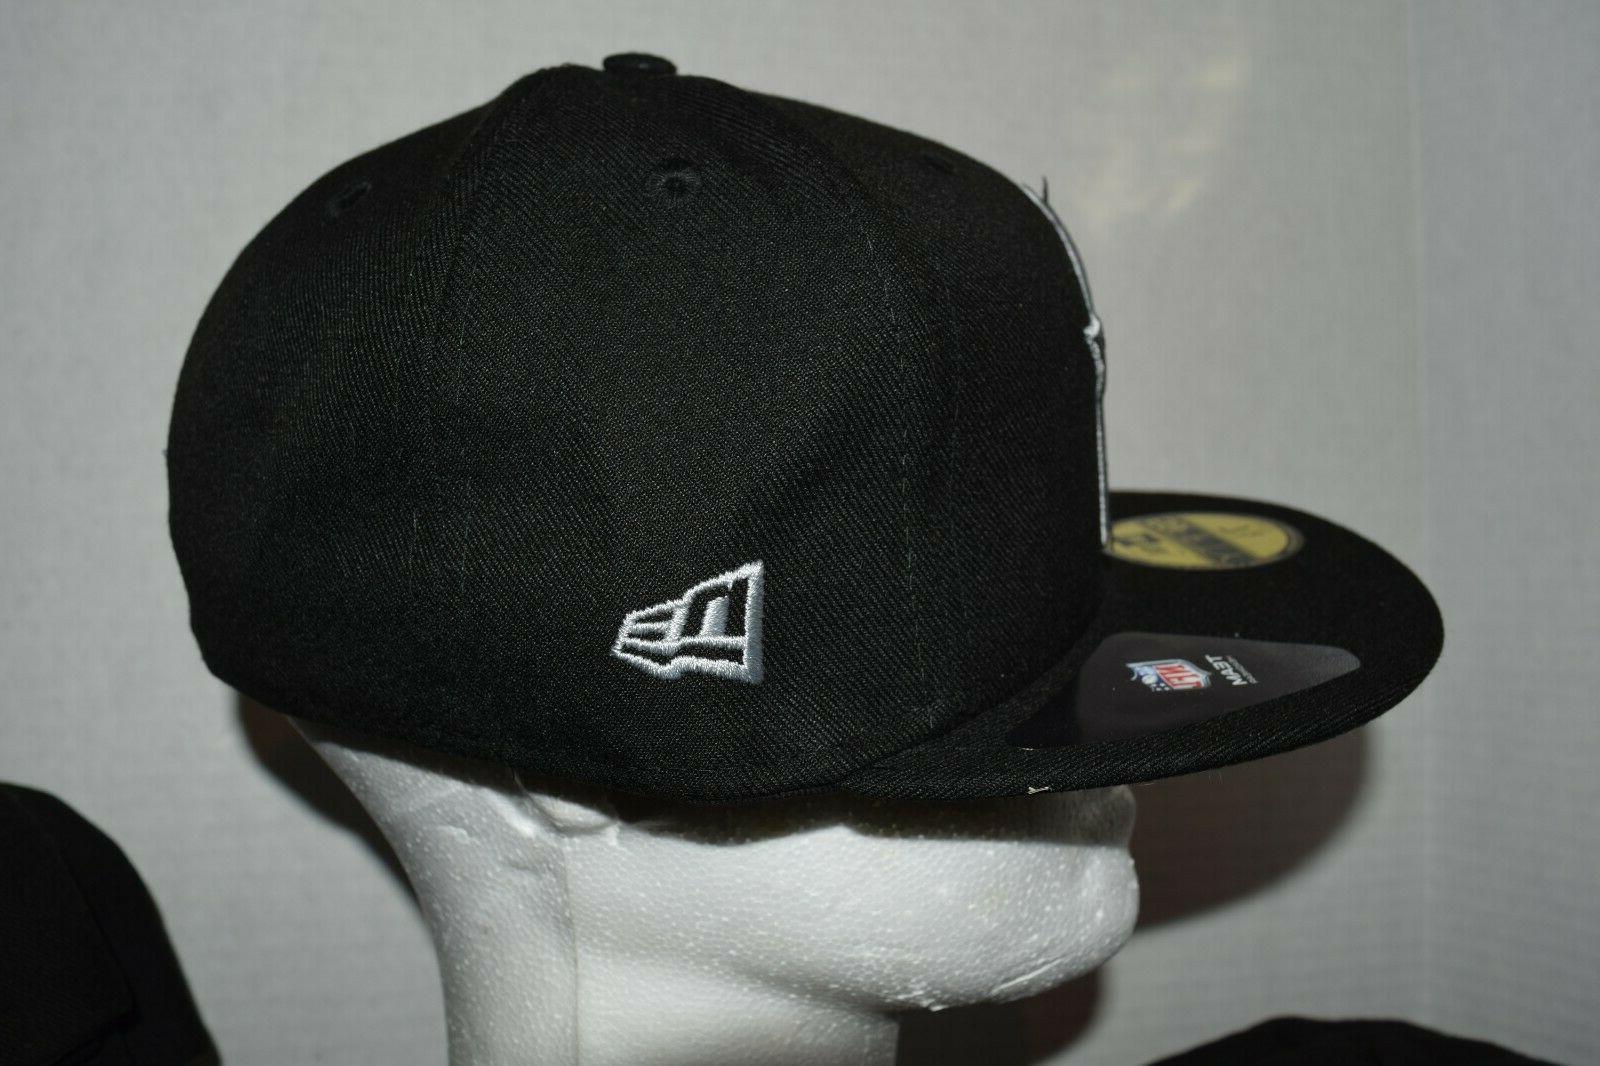 Dallas Cowboys New Era 59FIFTY Hat